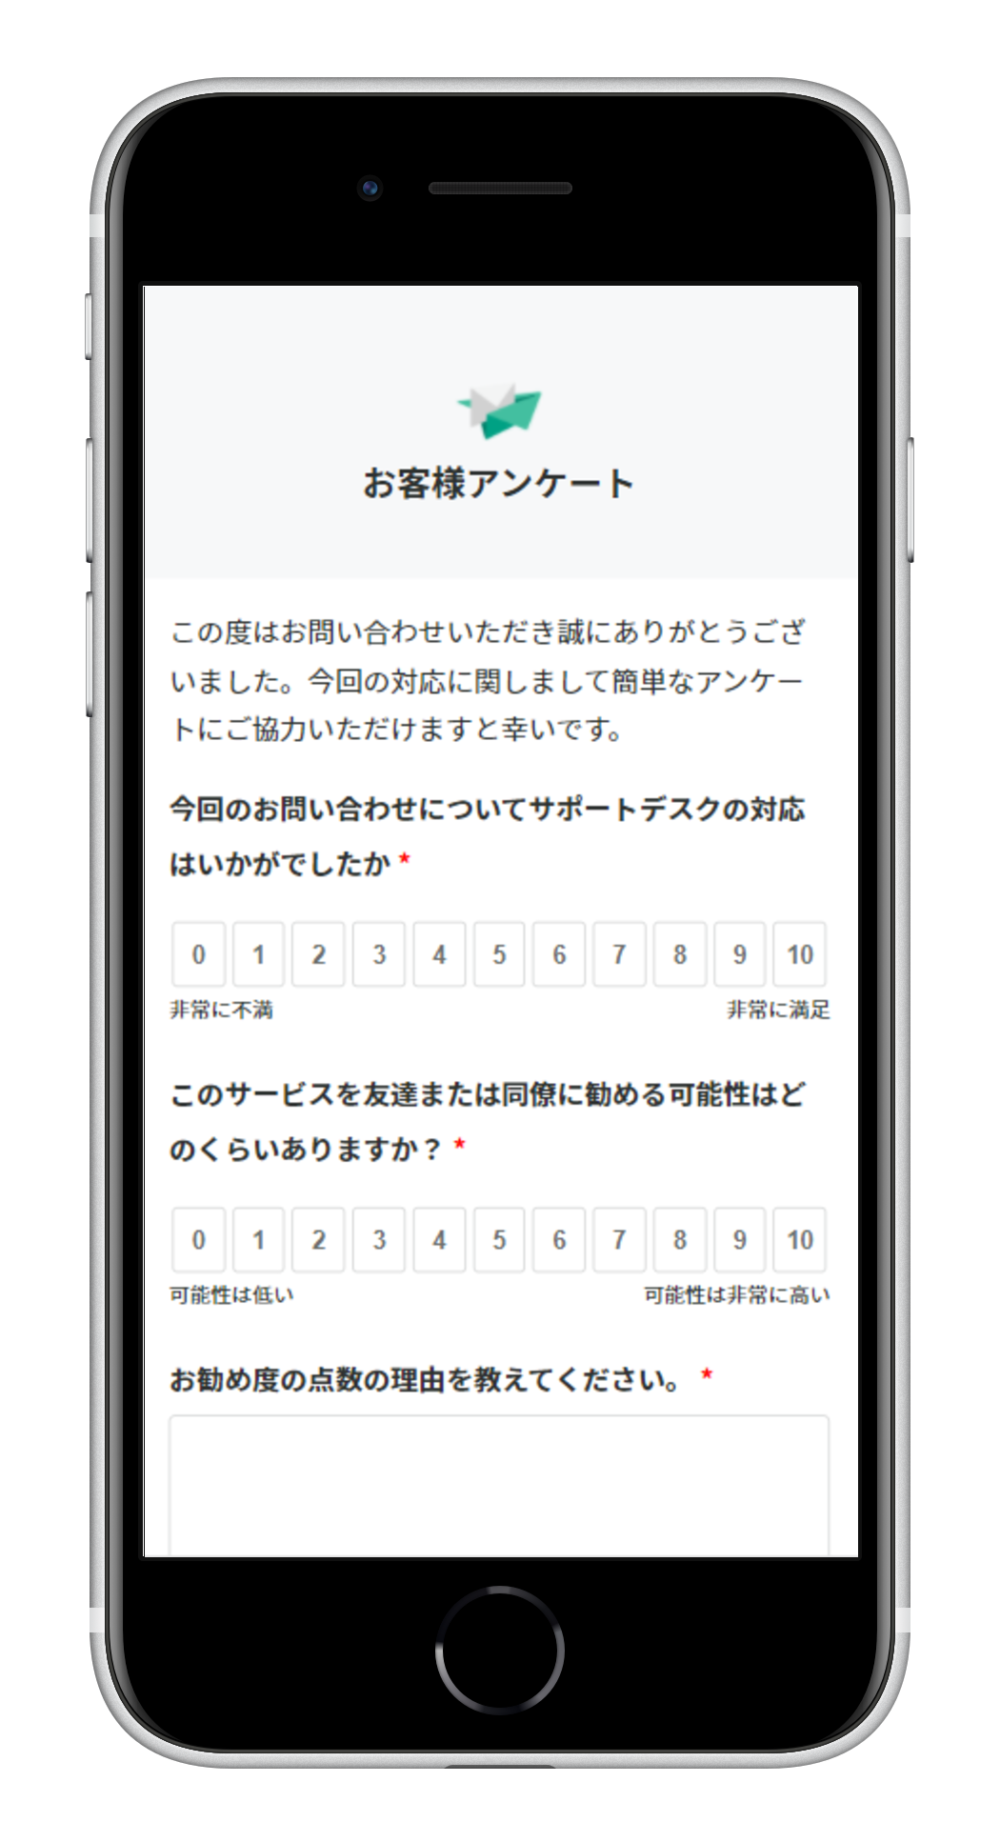 Tayoriの顧客満足度調査